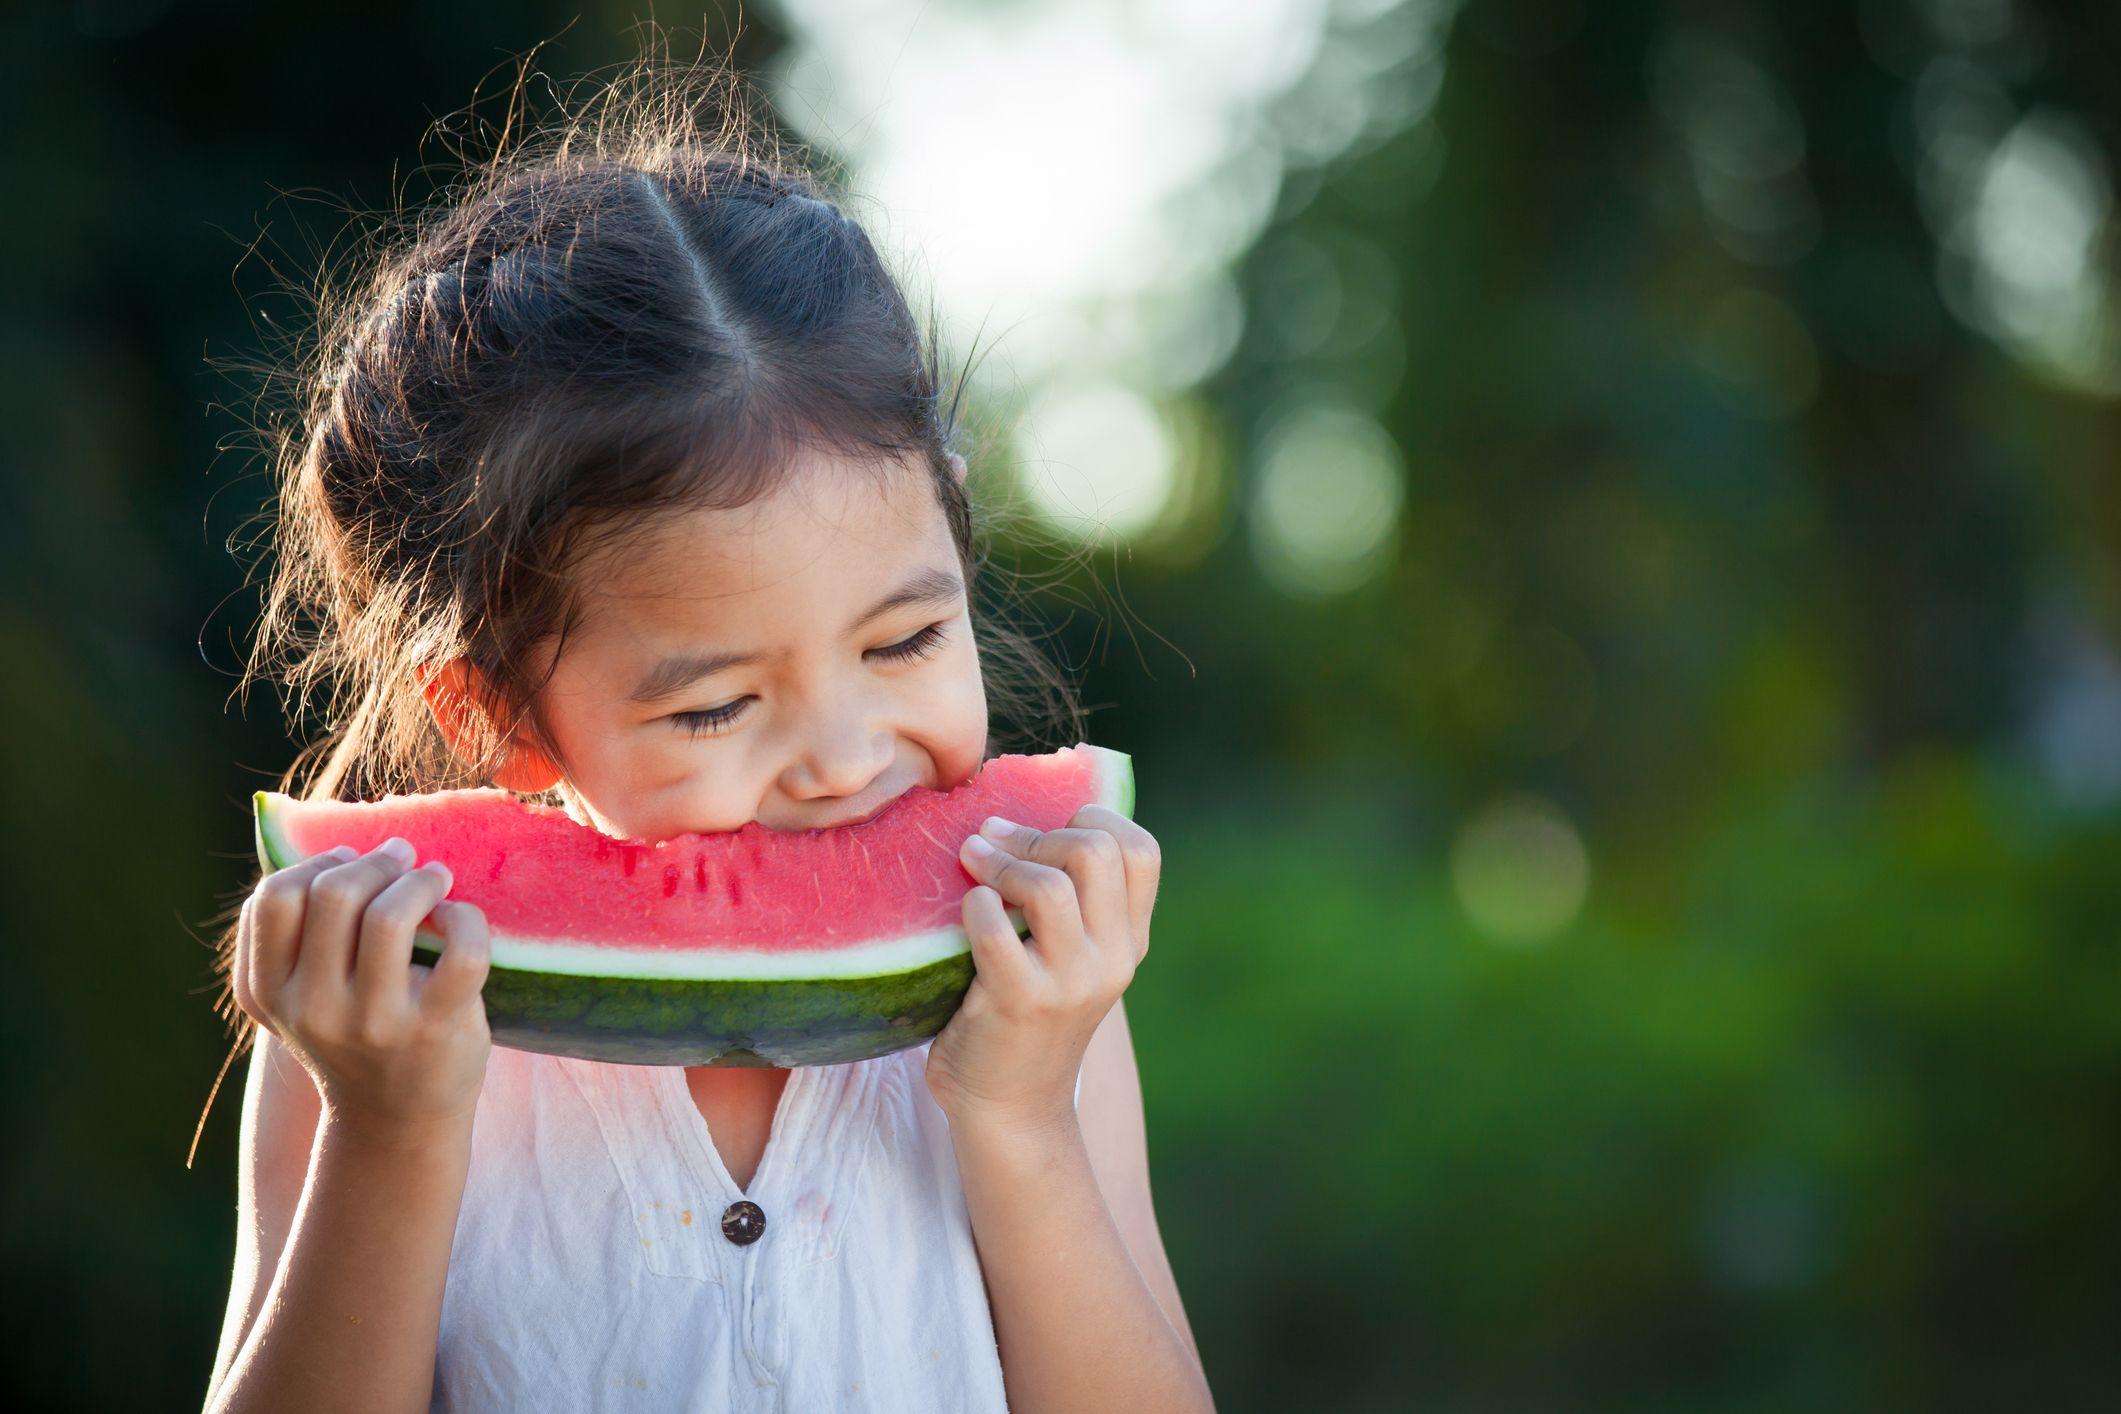 Melon-child-fruit-stock